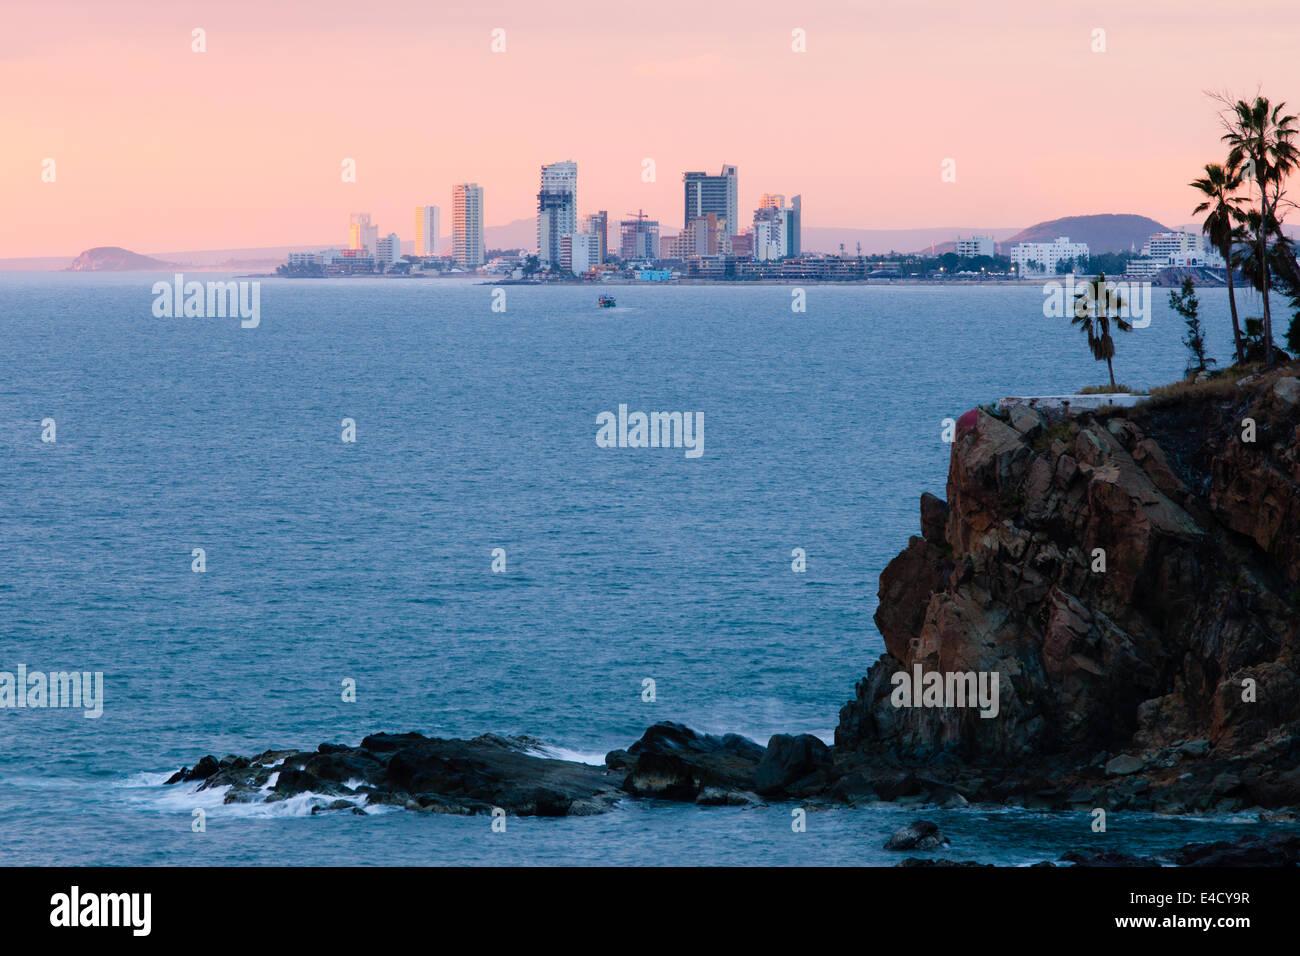 View of the Zona Dorada (Golden Zone) from across the bay in Mazatlan, Sinaloa, Mexico. - Stock Image